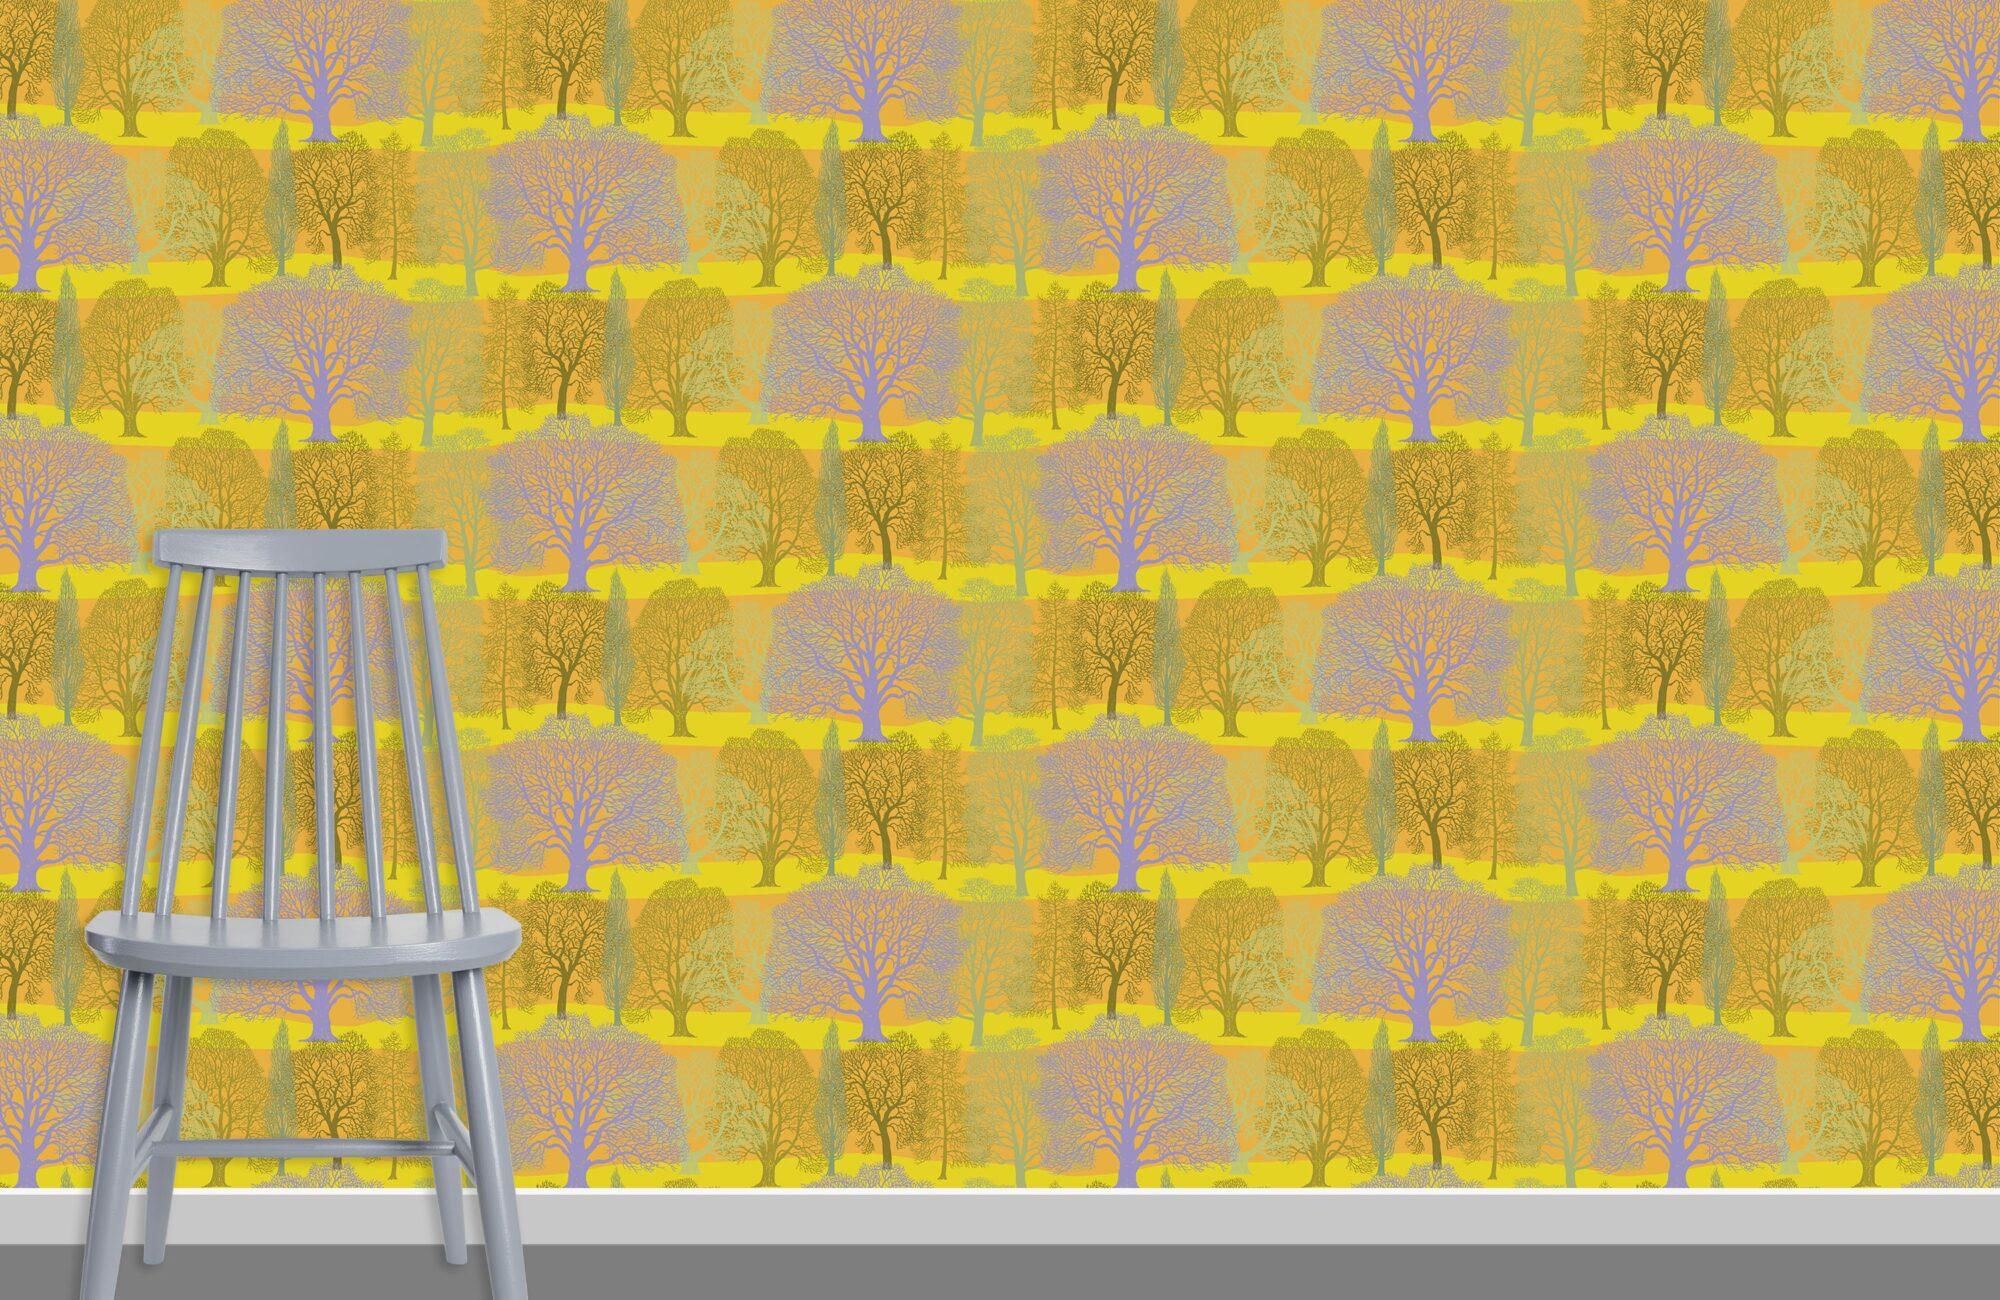 Trees Pattern Design H 37 26 HL 38 plus chair